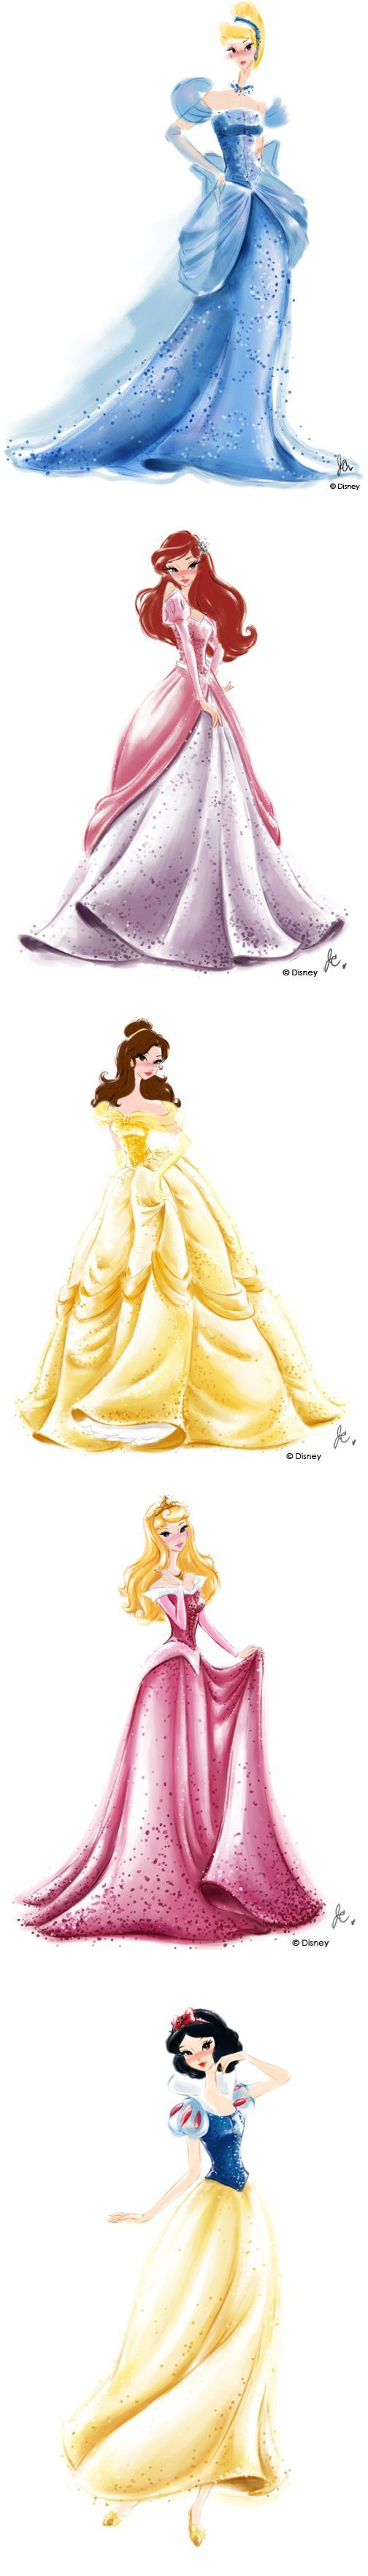 Drawn princess watercolor Chung on Watercolors ideas art